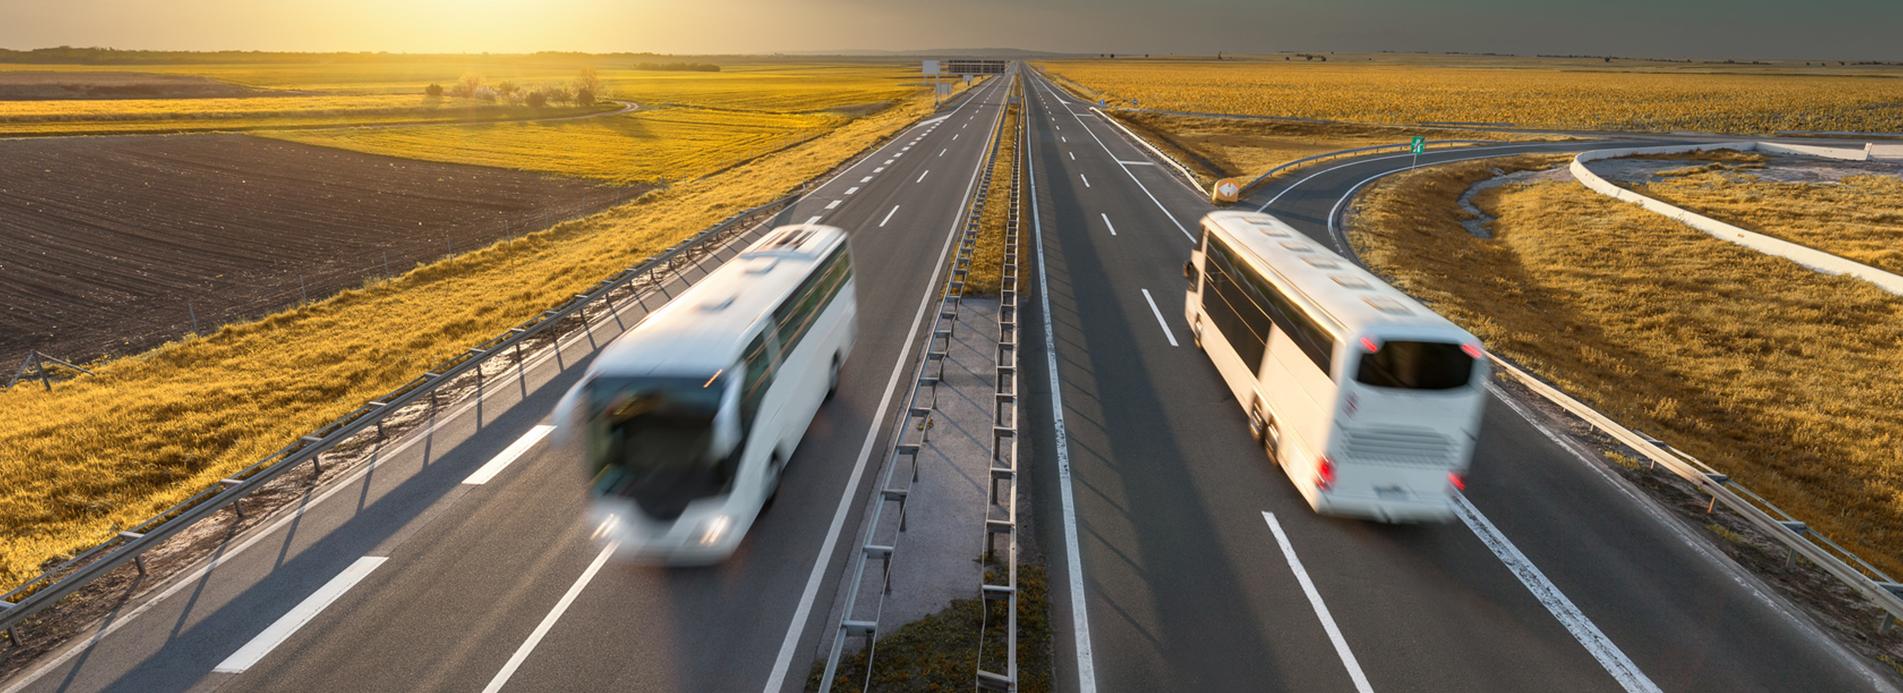 transports - cabaro - routes